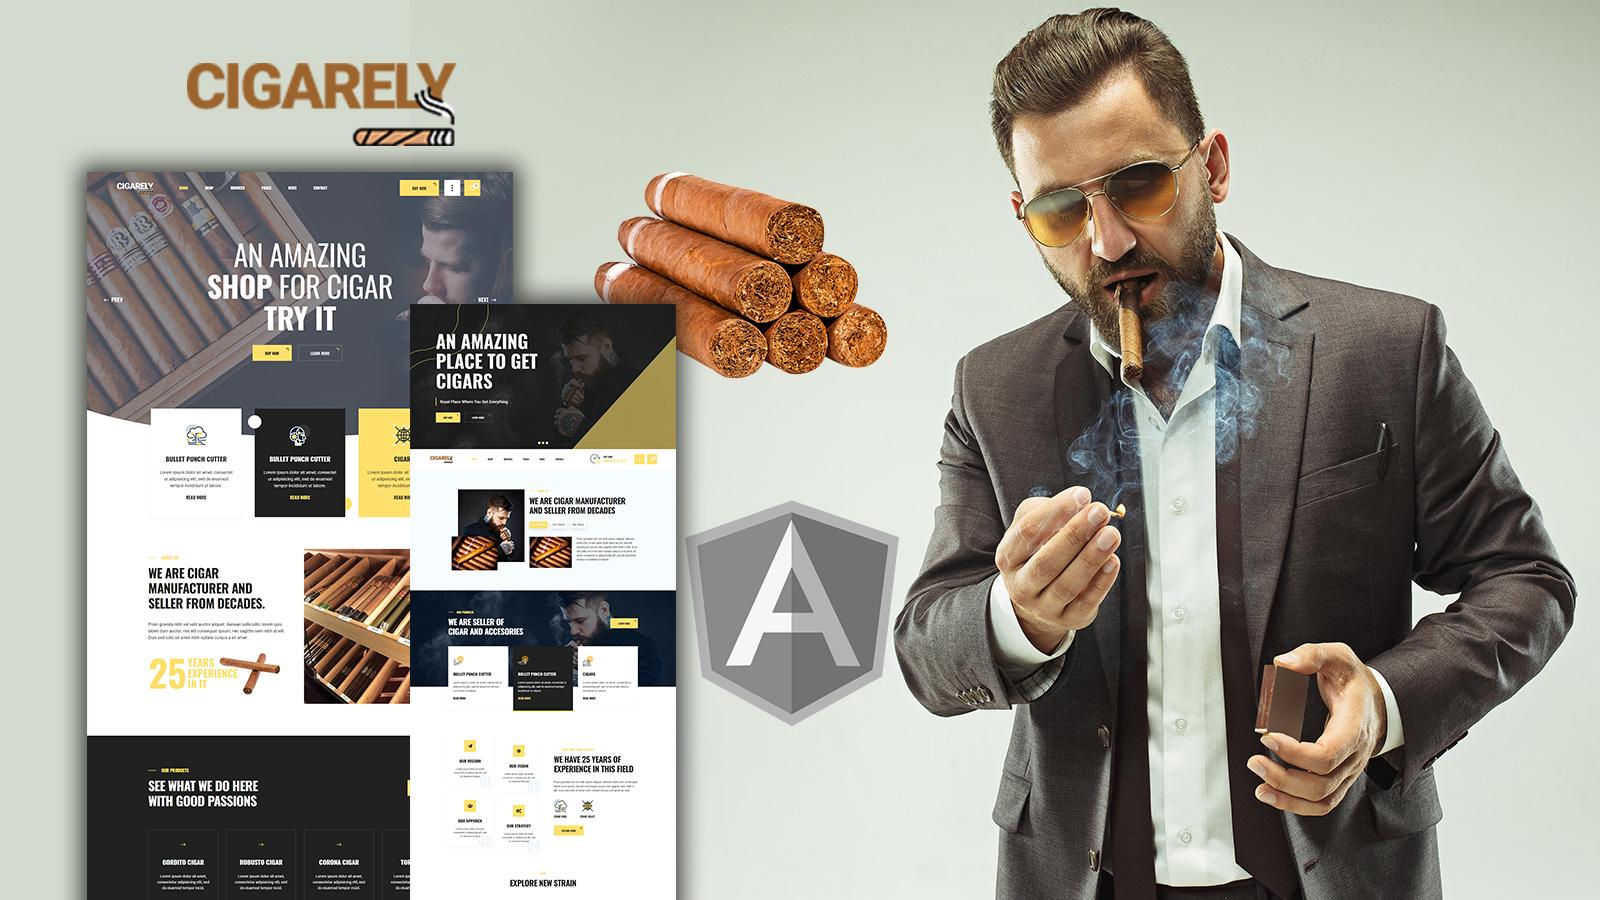 Cigarely - Cigar Shop Angular Template